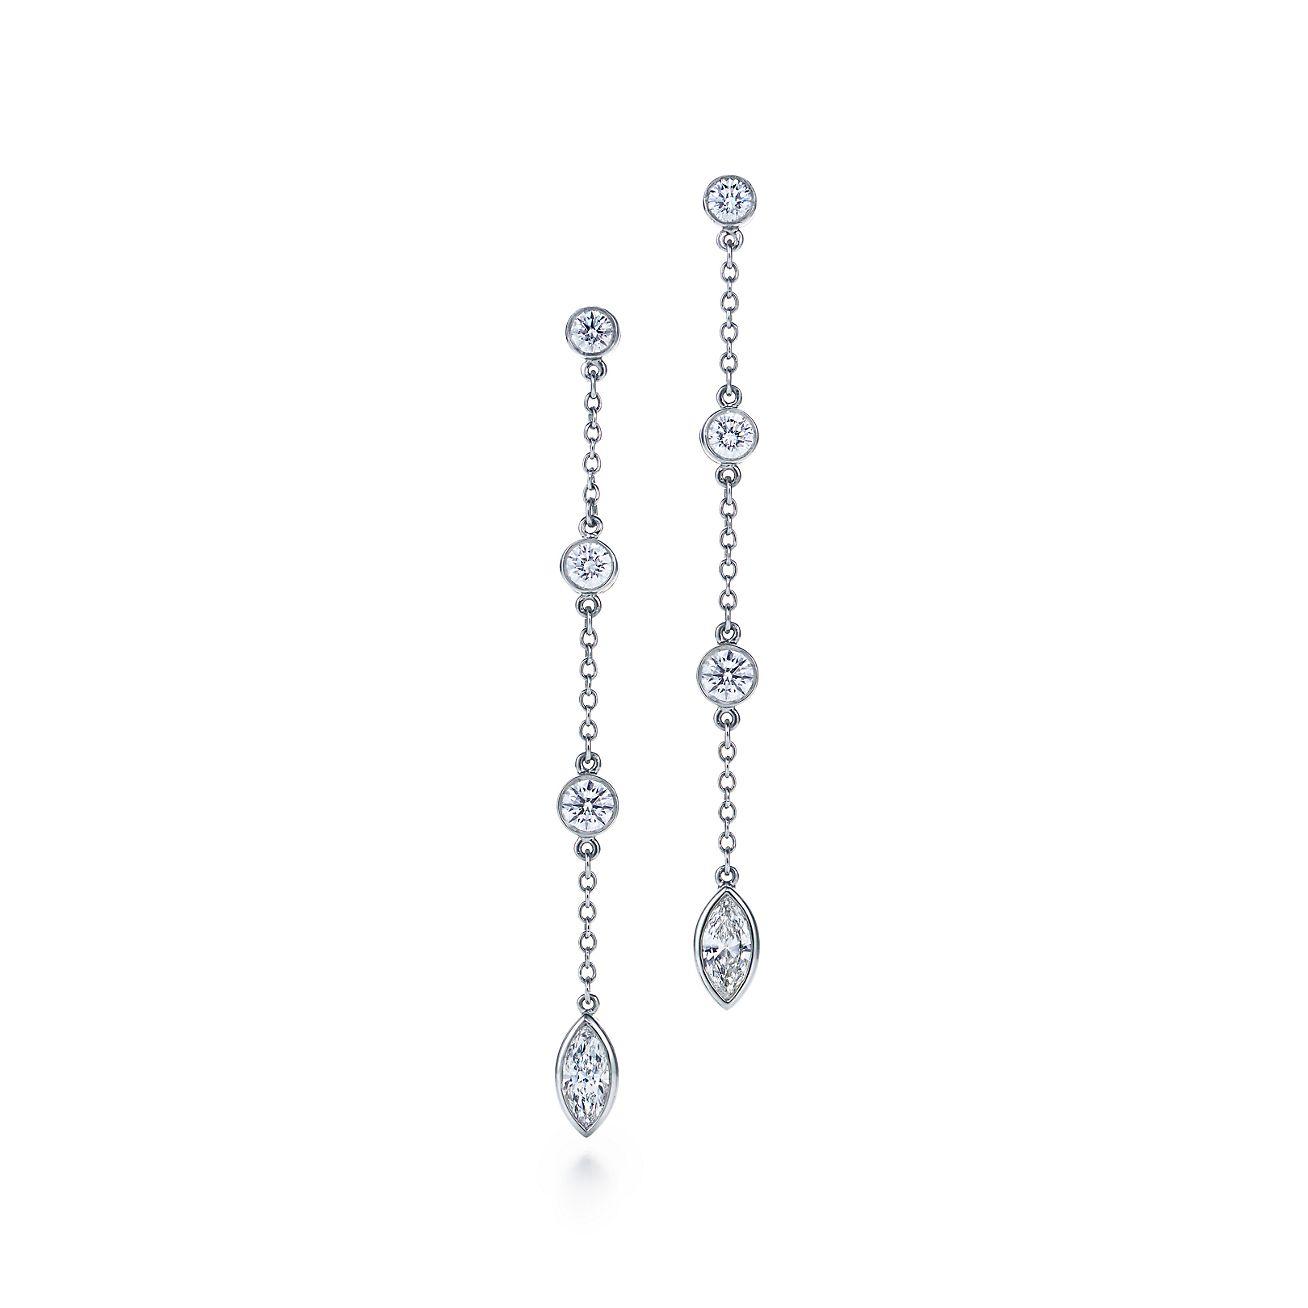 b6cacbded ... tiffany jazz™ drop earrings with diamonds in platinum. tiffany co. ...